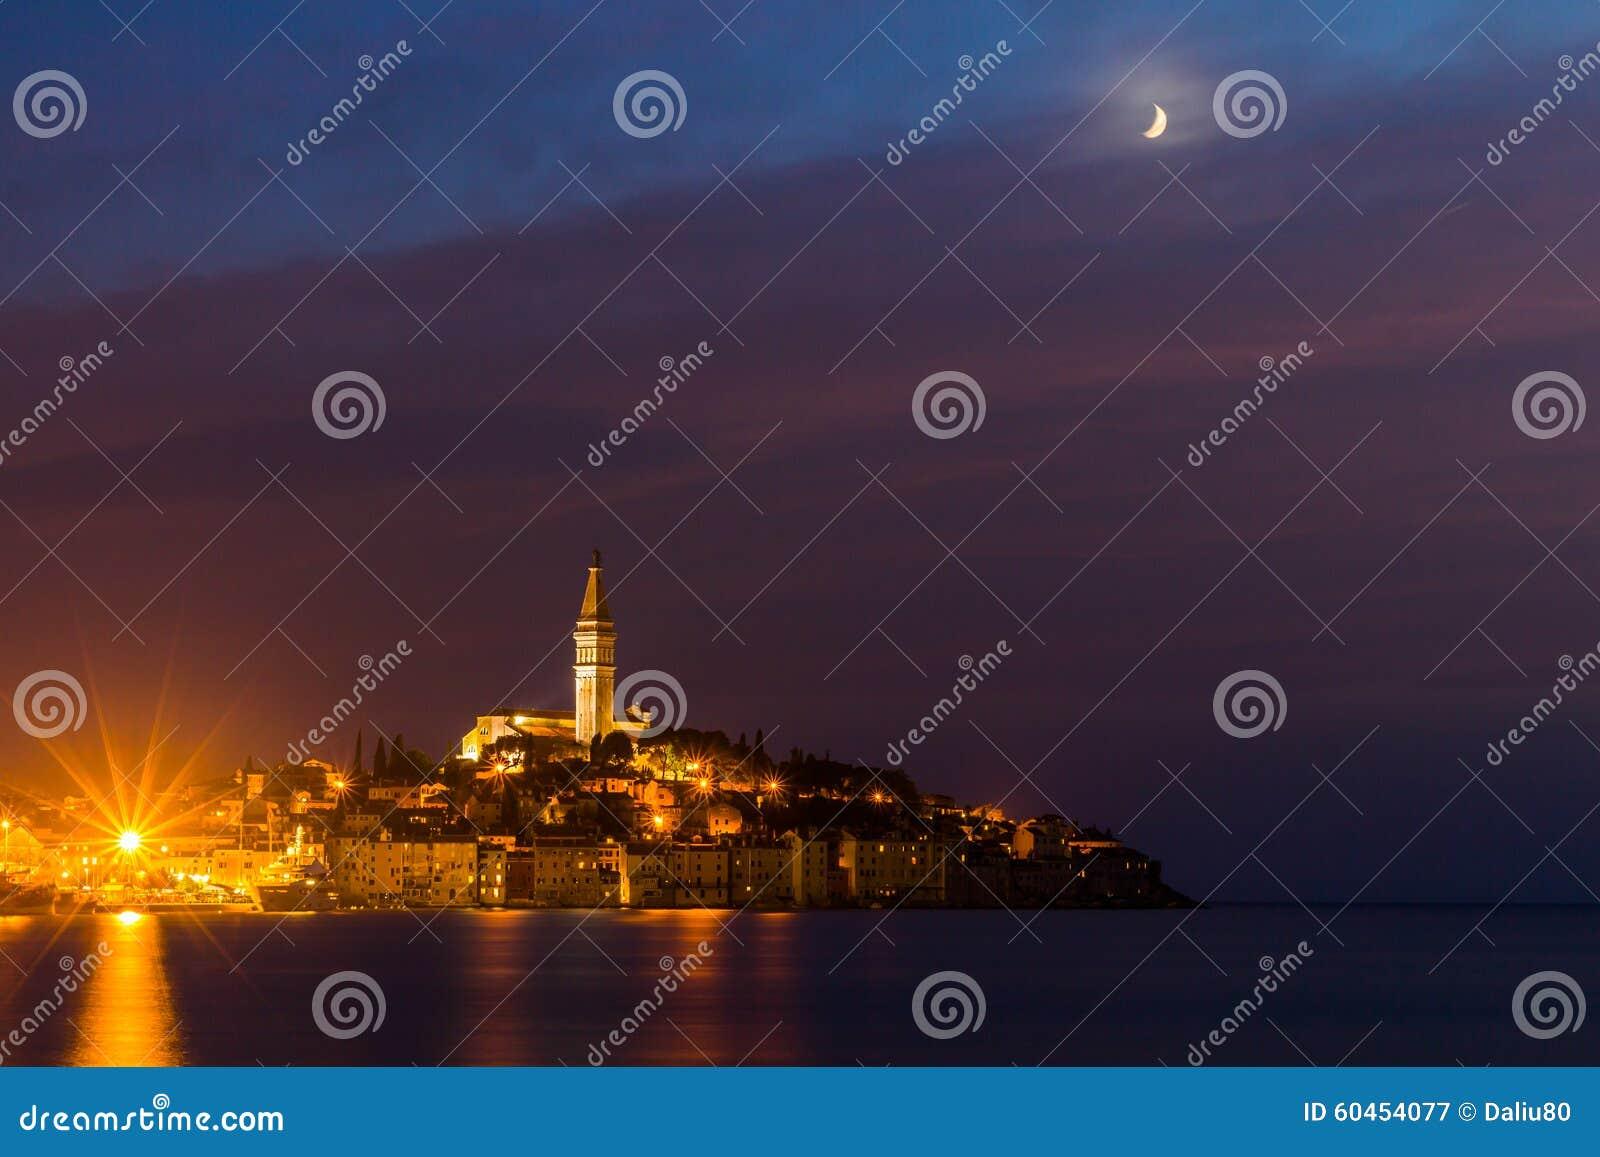 Rovinj old town at night with moon on the colorful sky, Adriatic sea coast of Croatia, Europe